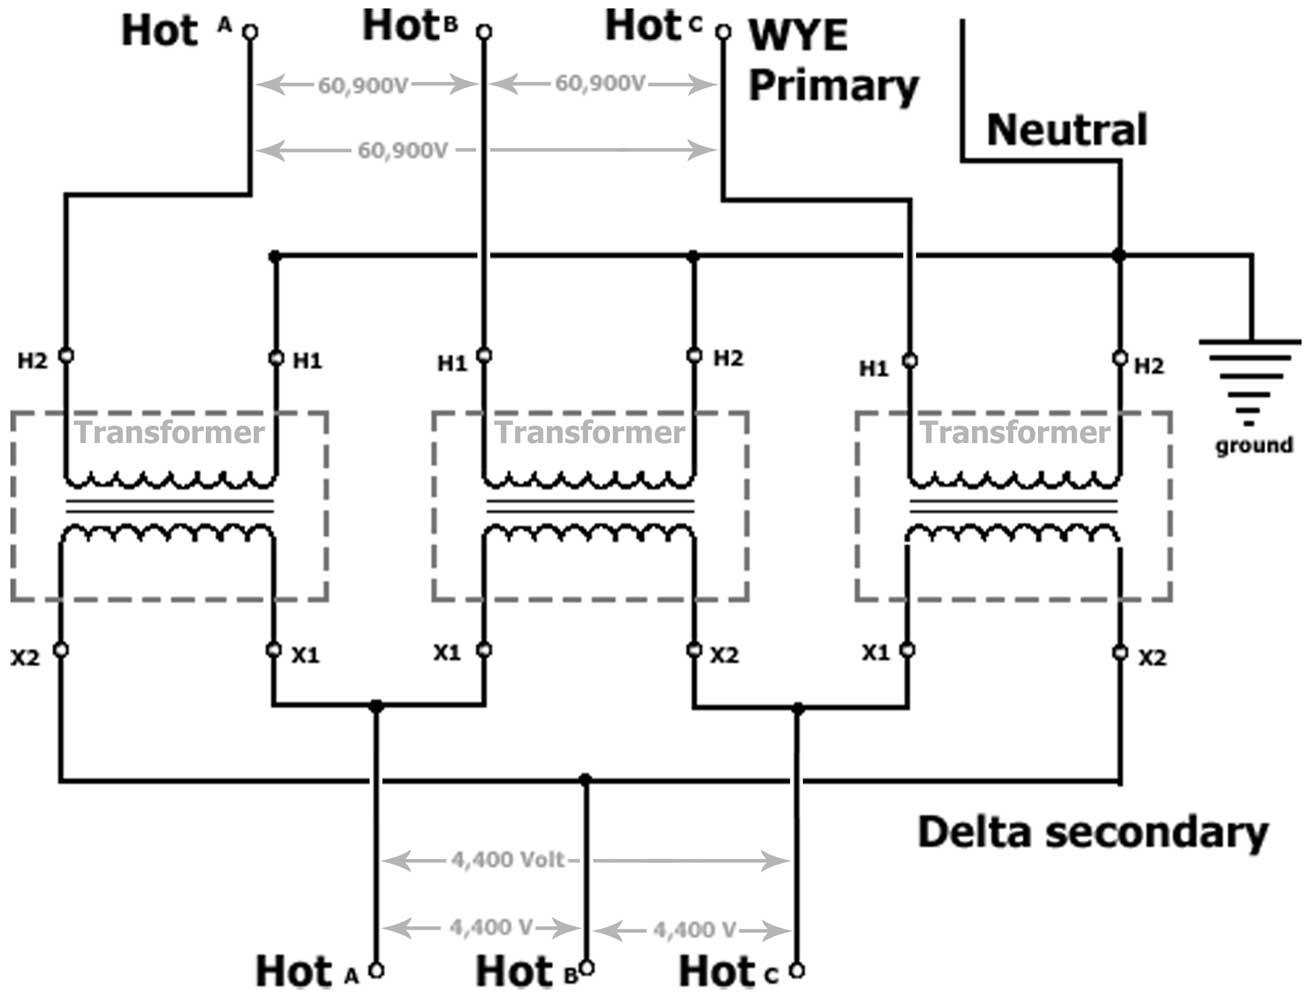 service panel grounding diagram john deere stx38 wiring black deck power line transformer all data how to identify